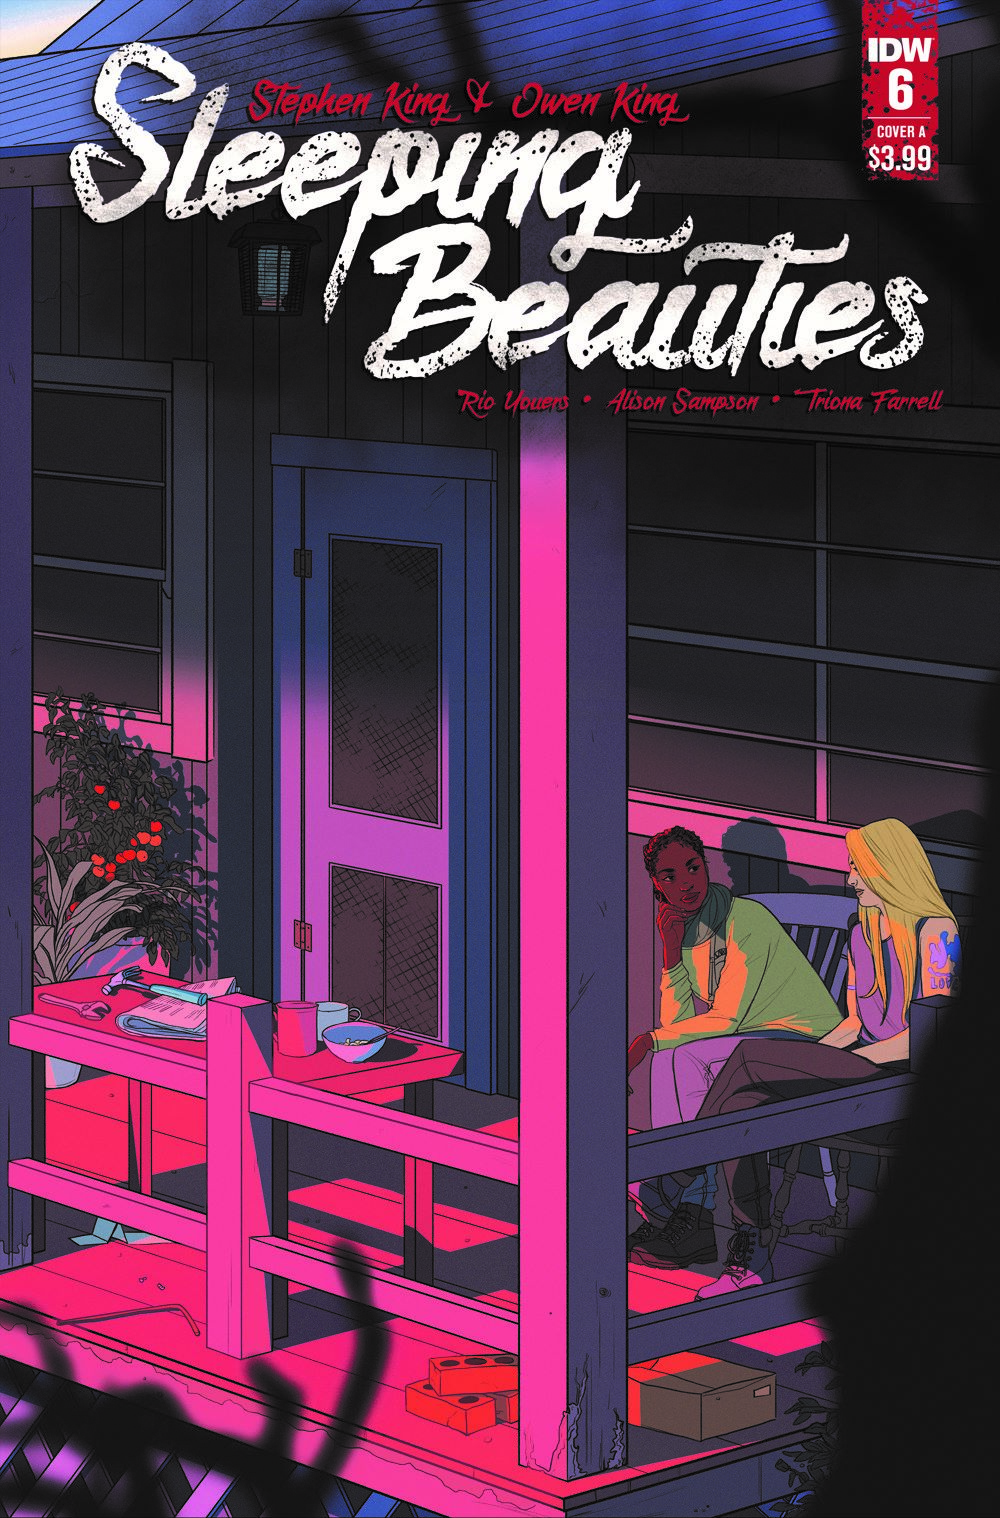 SleepingBeauties_06_CVR_A-2 ComicList Previews: SLEEPING BEAUTIES #6 (OF 10)